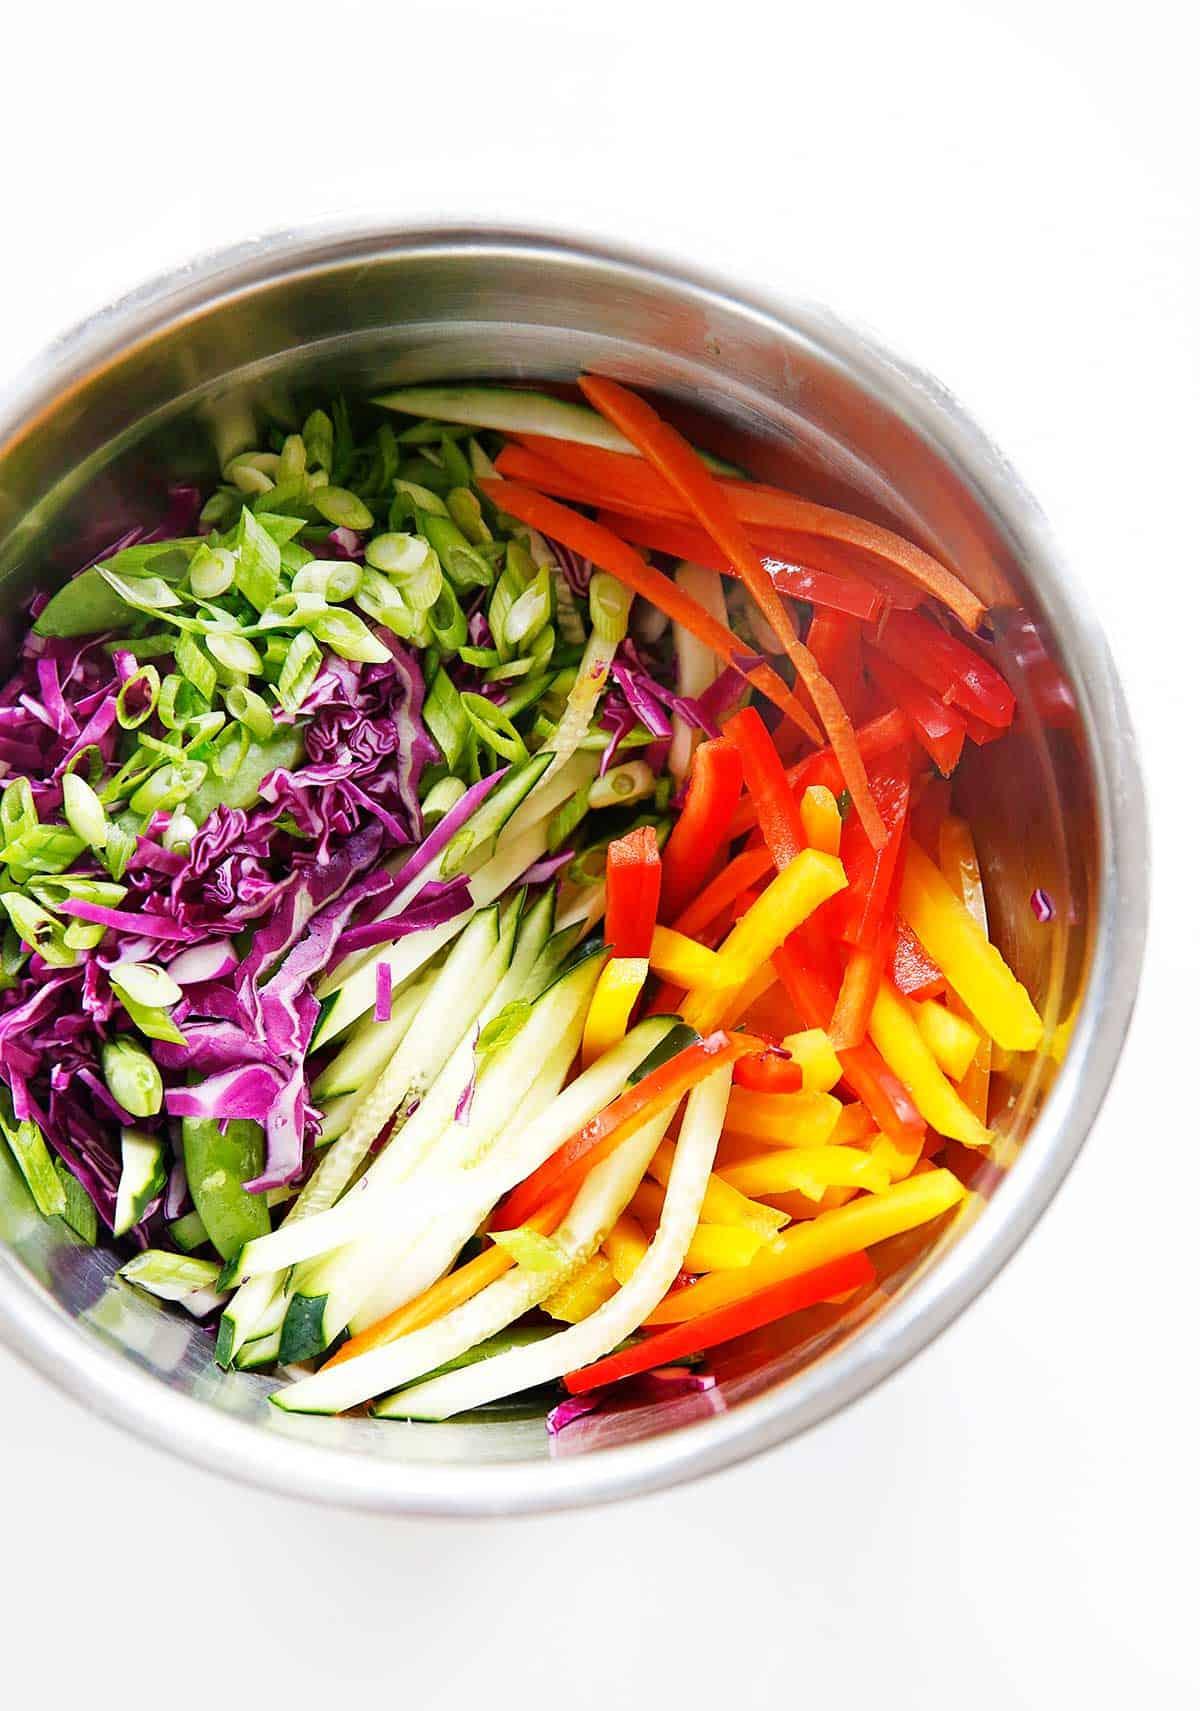 Cold Asian Noodle Salad {Gluten-free, Vegetarian}   Lexi's Clean Kitchen